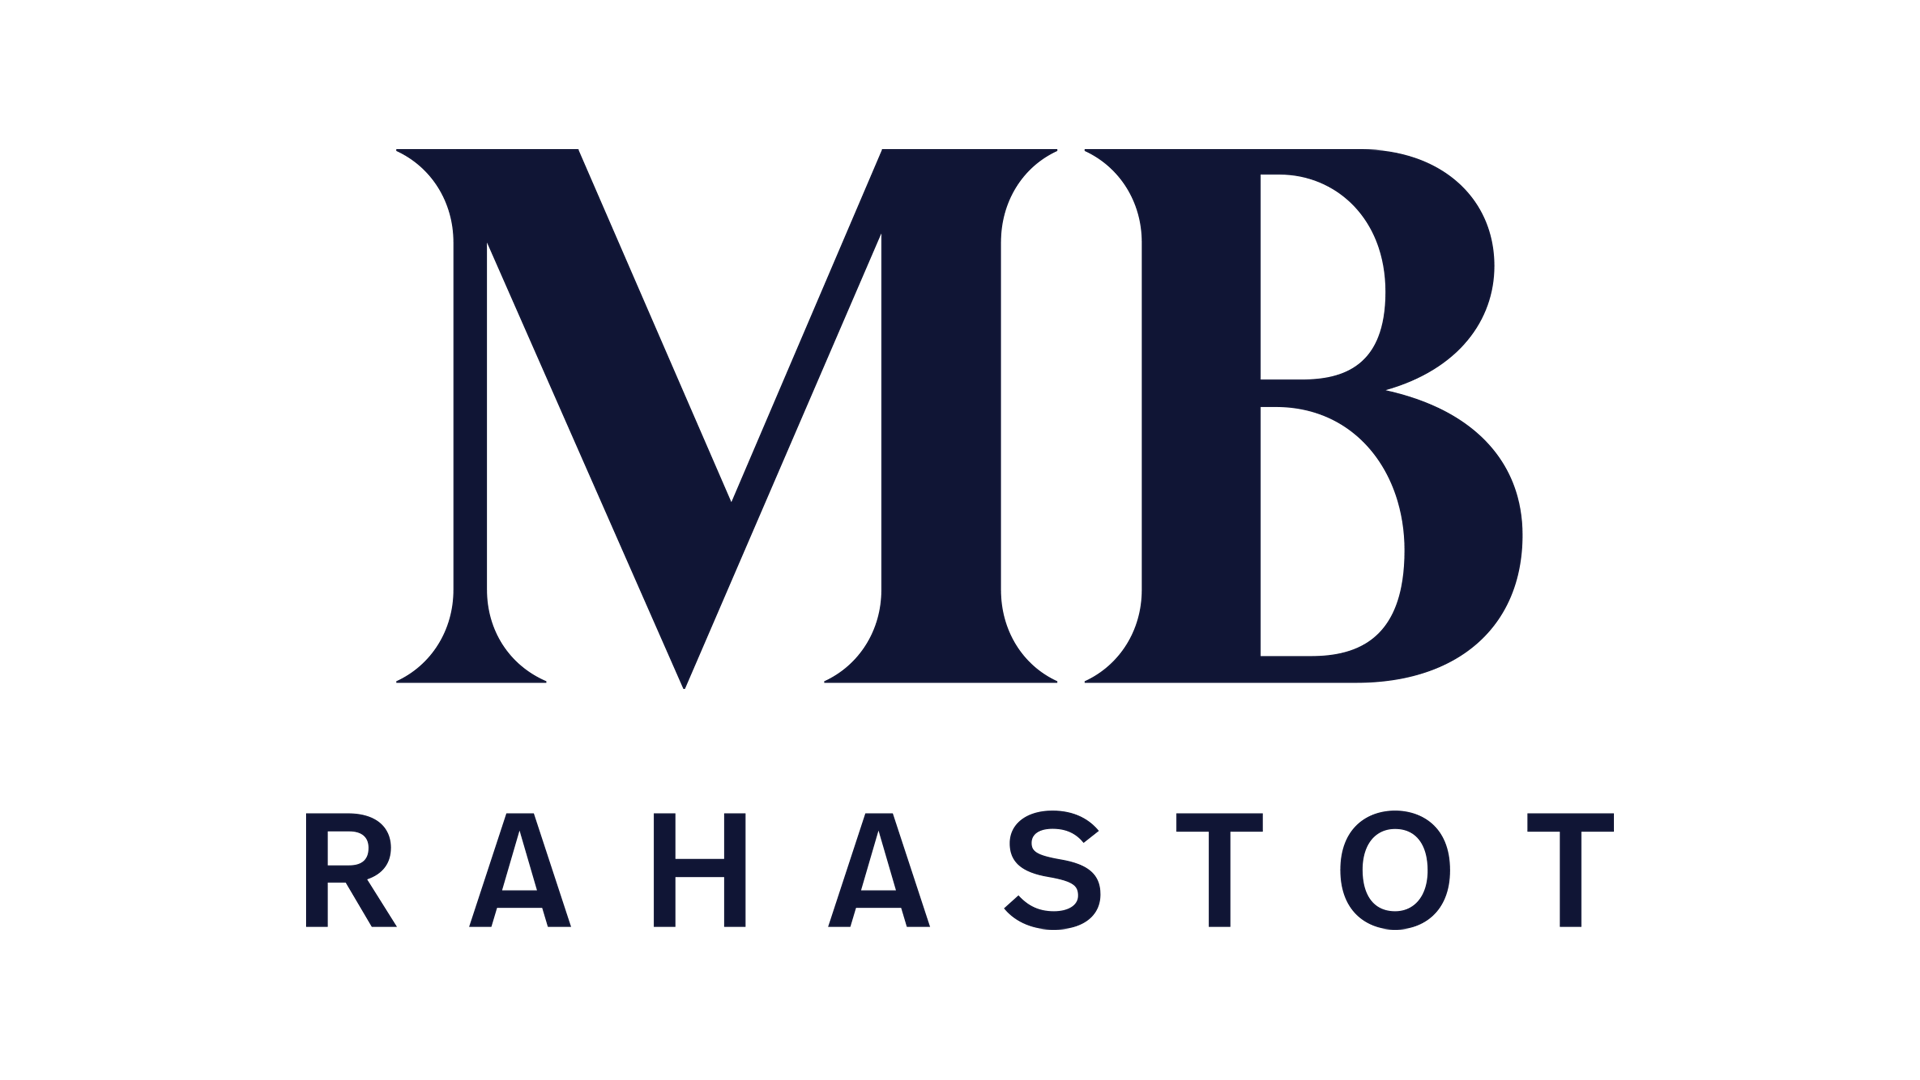 MB Rahastot